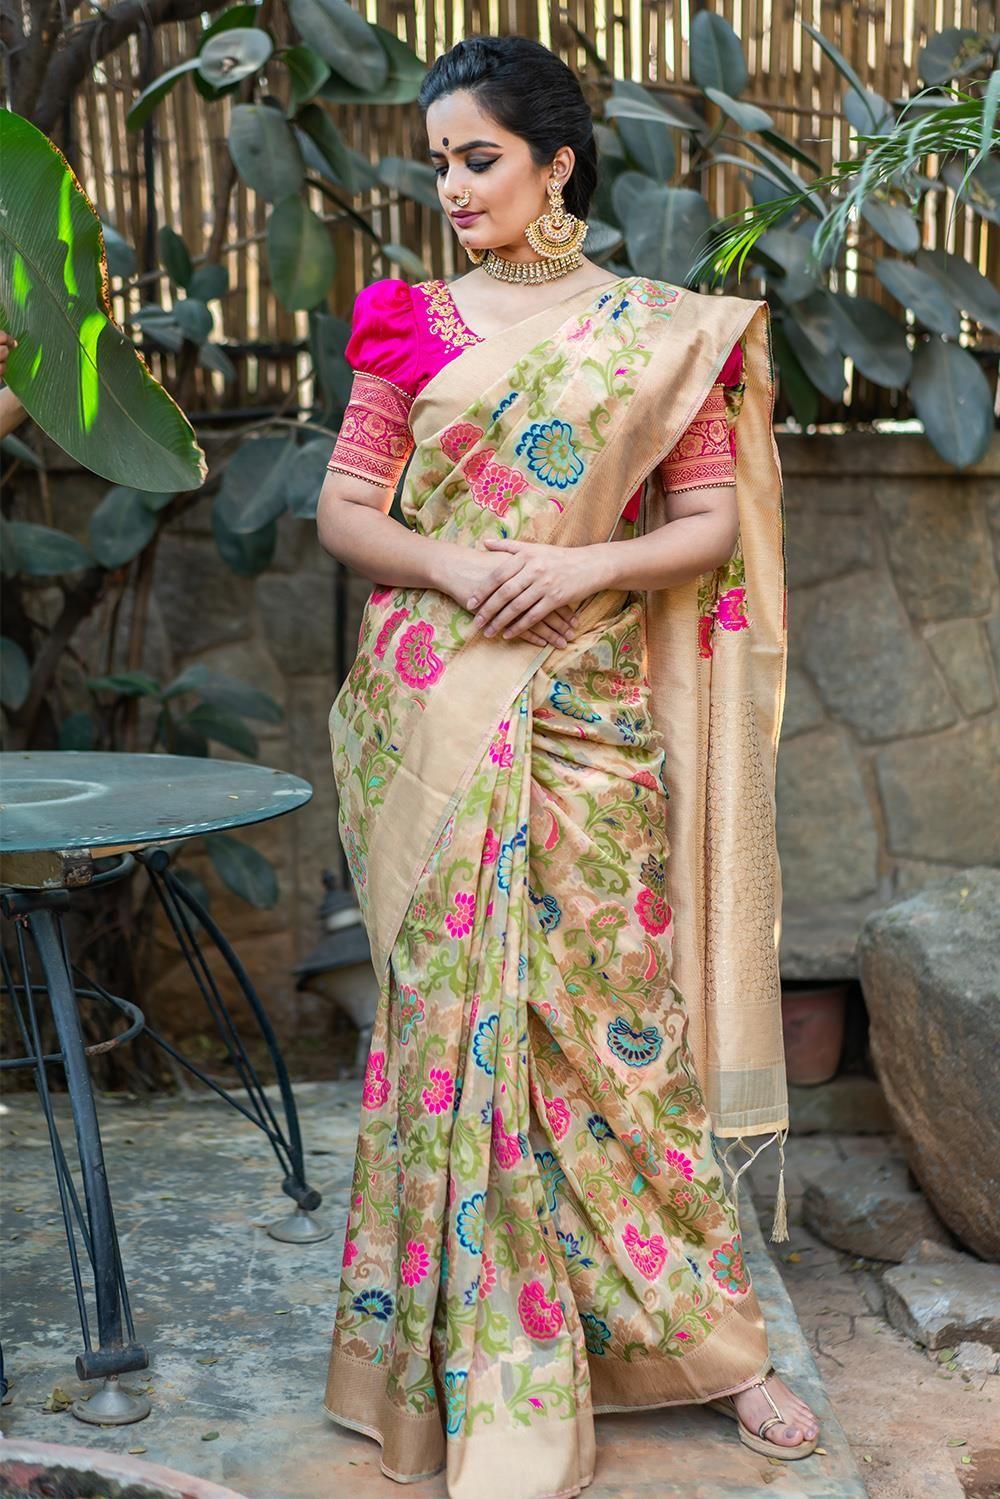 85a87450e90354 Niloufer  saree  blouse  houseofblouse  indian  bollywood  style  designer   cream  floral  pink  blue  green  banaras  tussar  gold  border